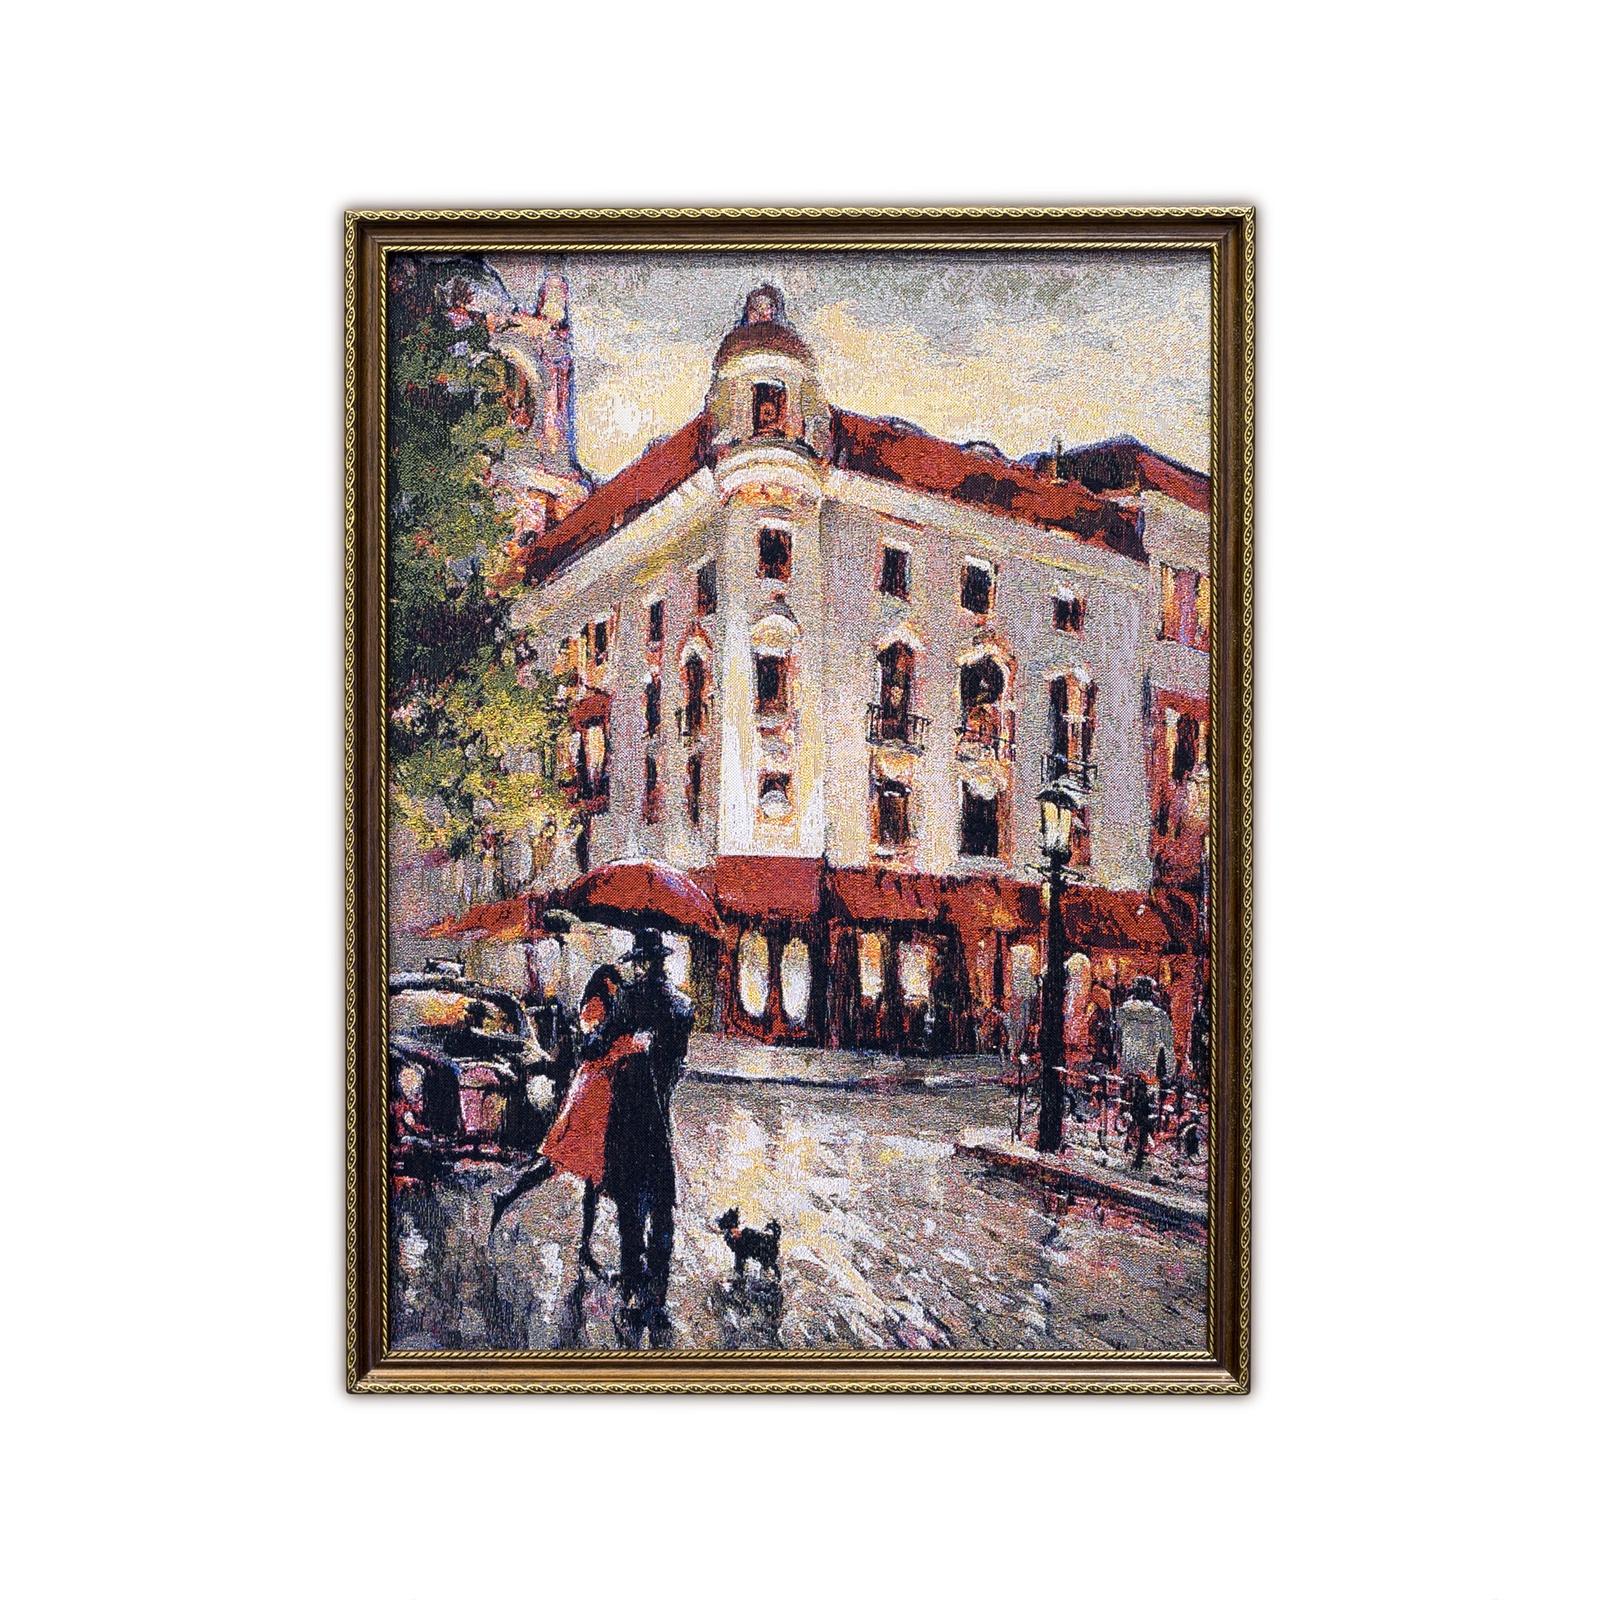 Картина Магазин гобеленов под дождем 52*69 см, Гобелен